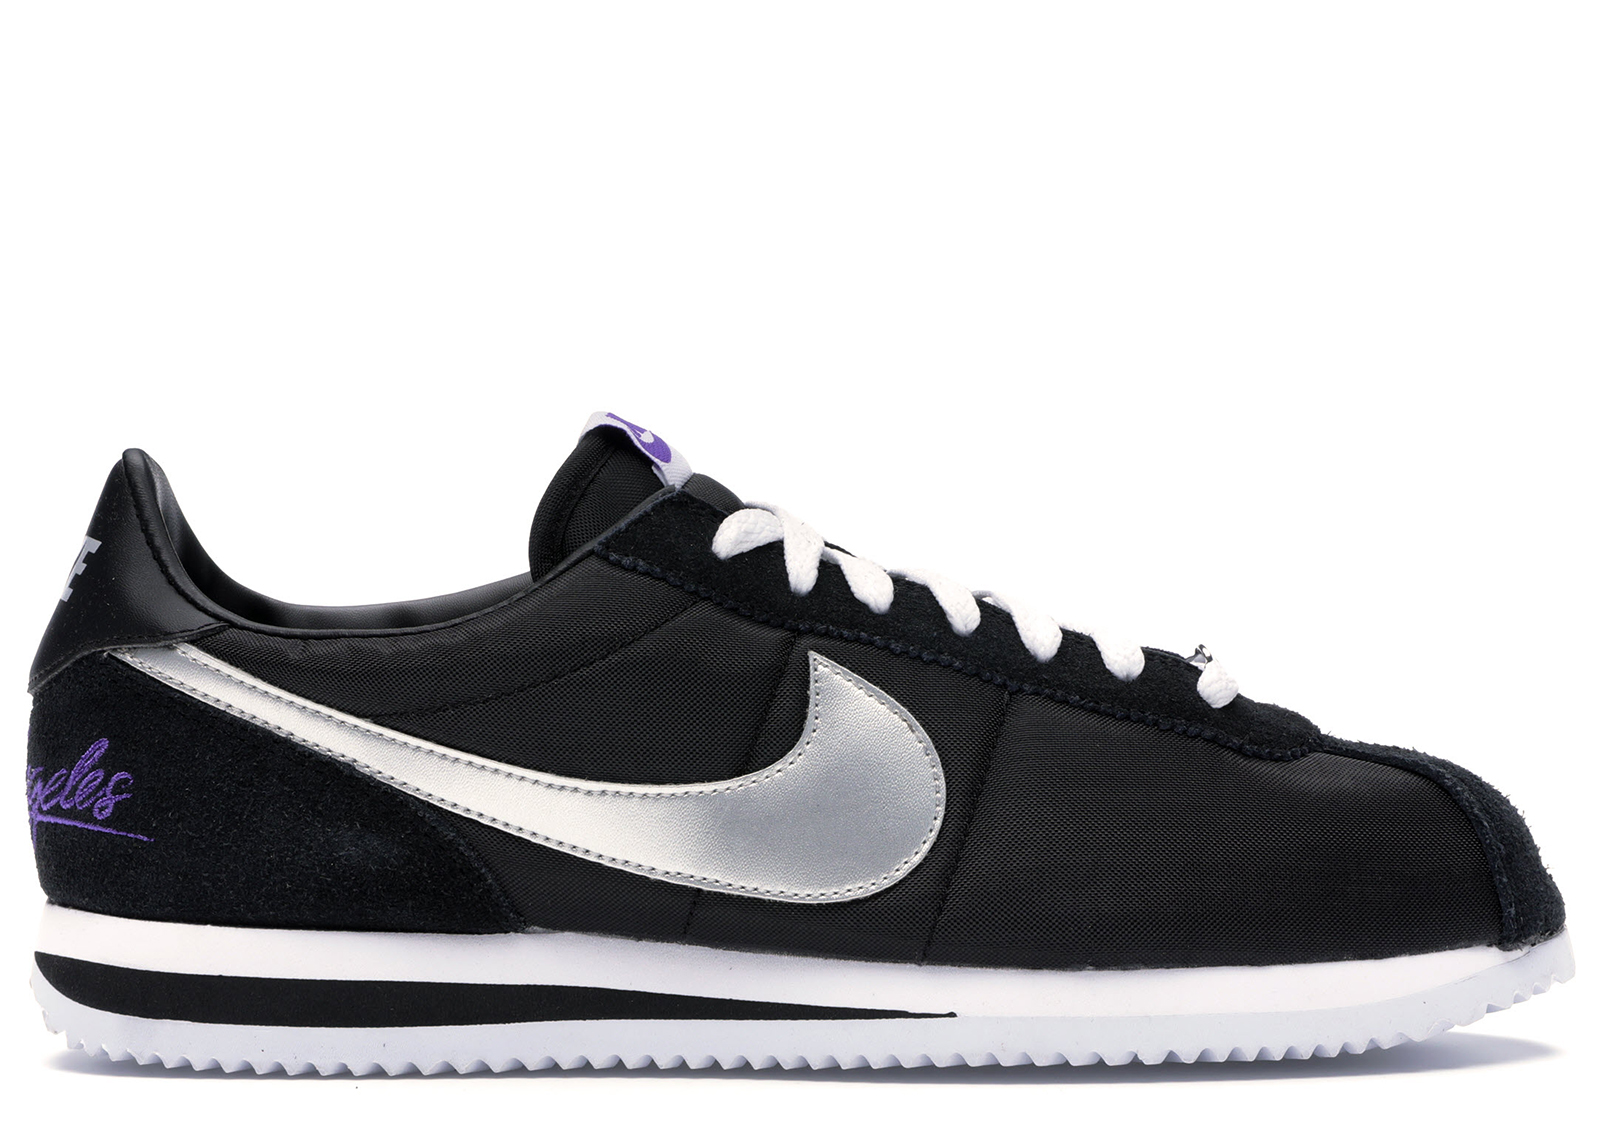 Nike Cortez Los Angeles Black - CI9873-001